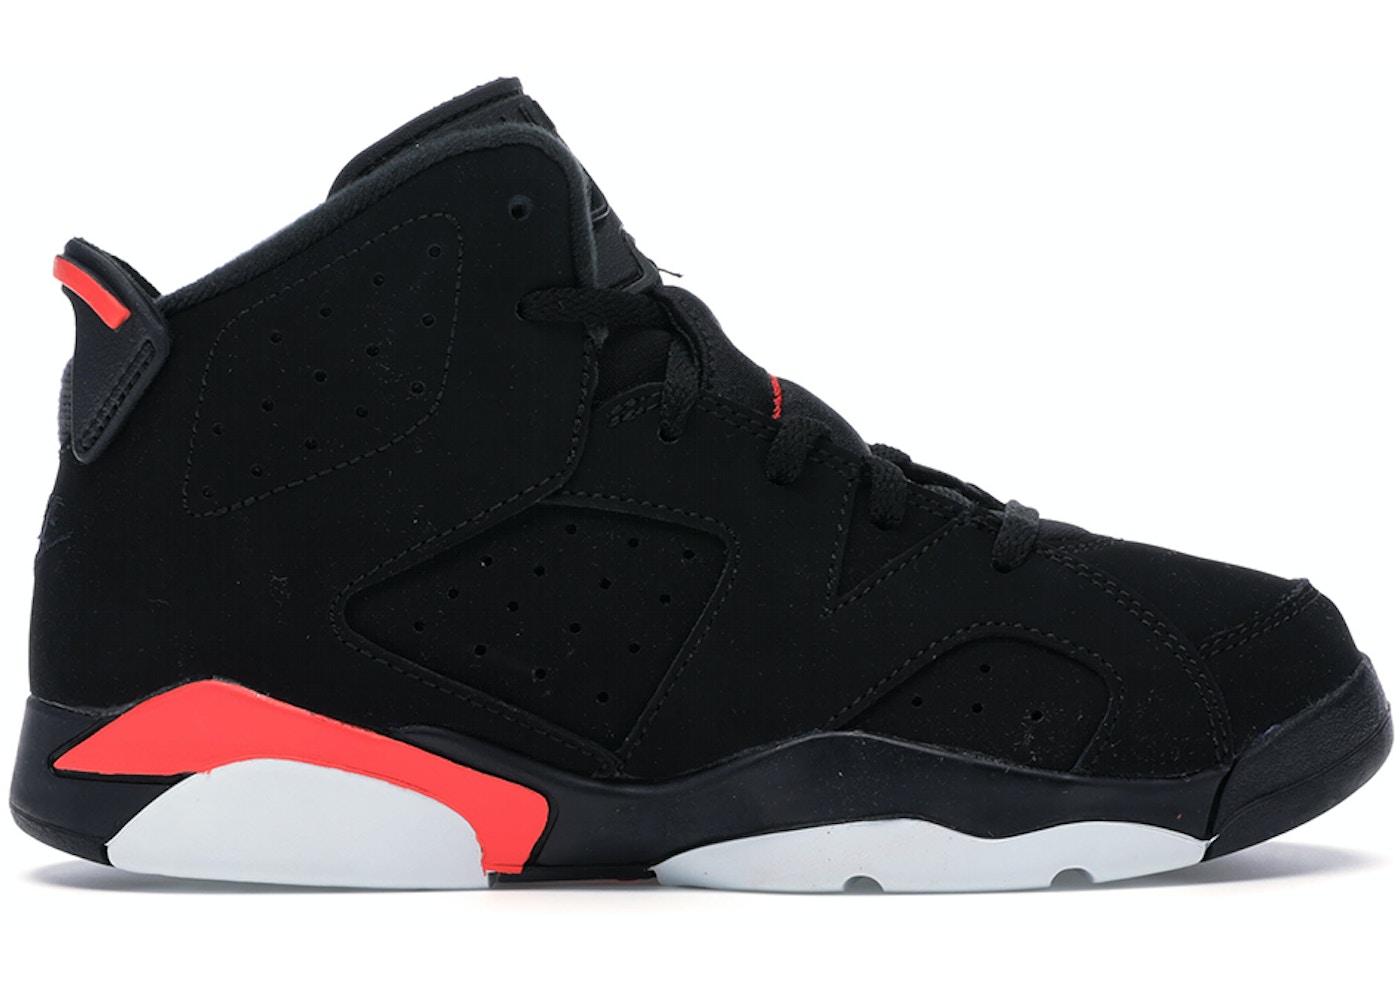 hot sale online 8d7c0 d049b Jordan 6 Retro Black Infrared 2019 (PS)